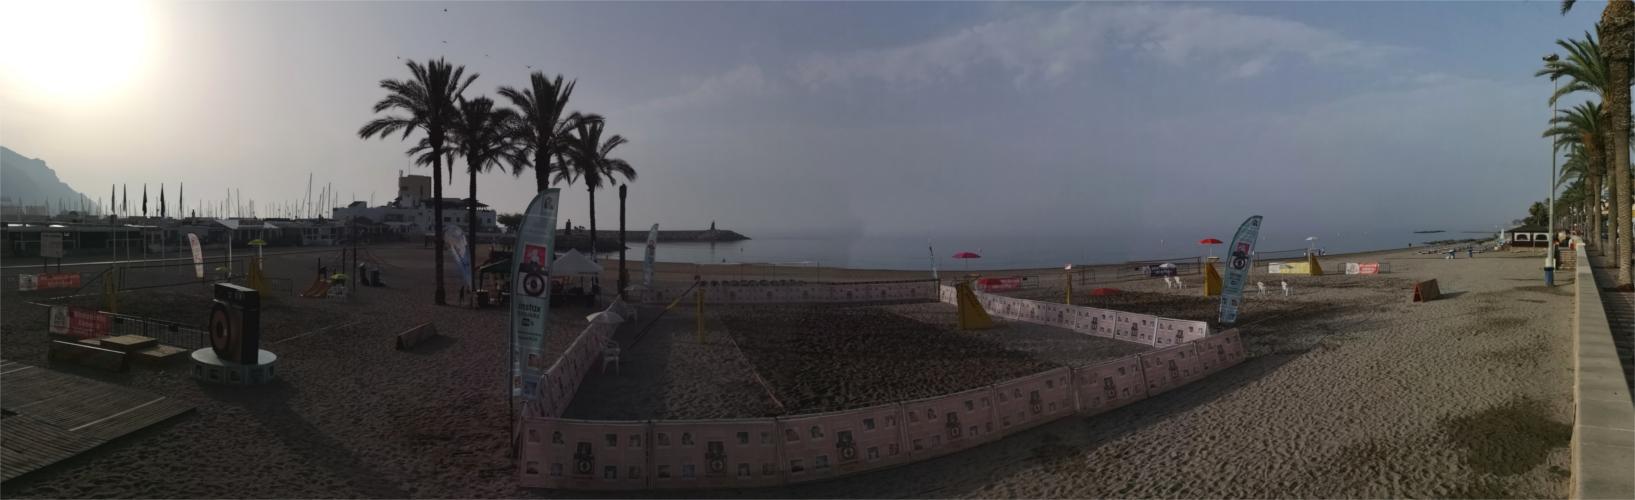 Torneo Voley Playa Fuji-Mintonette, Aguadulce.